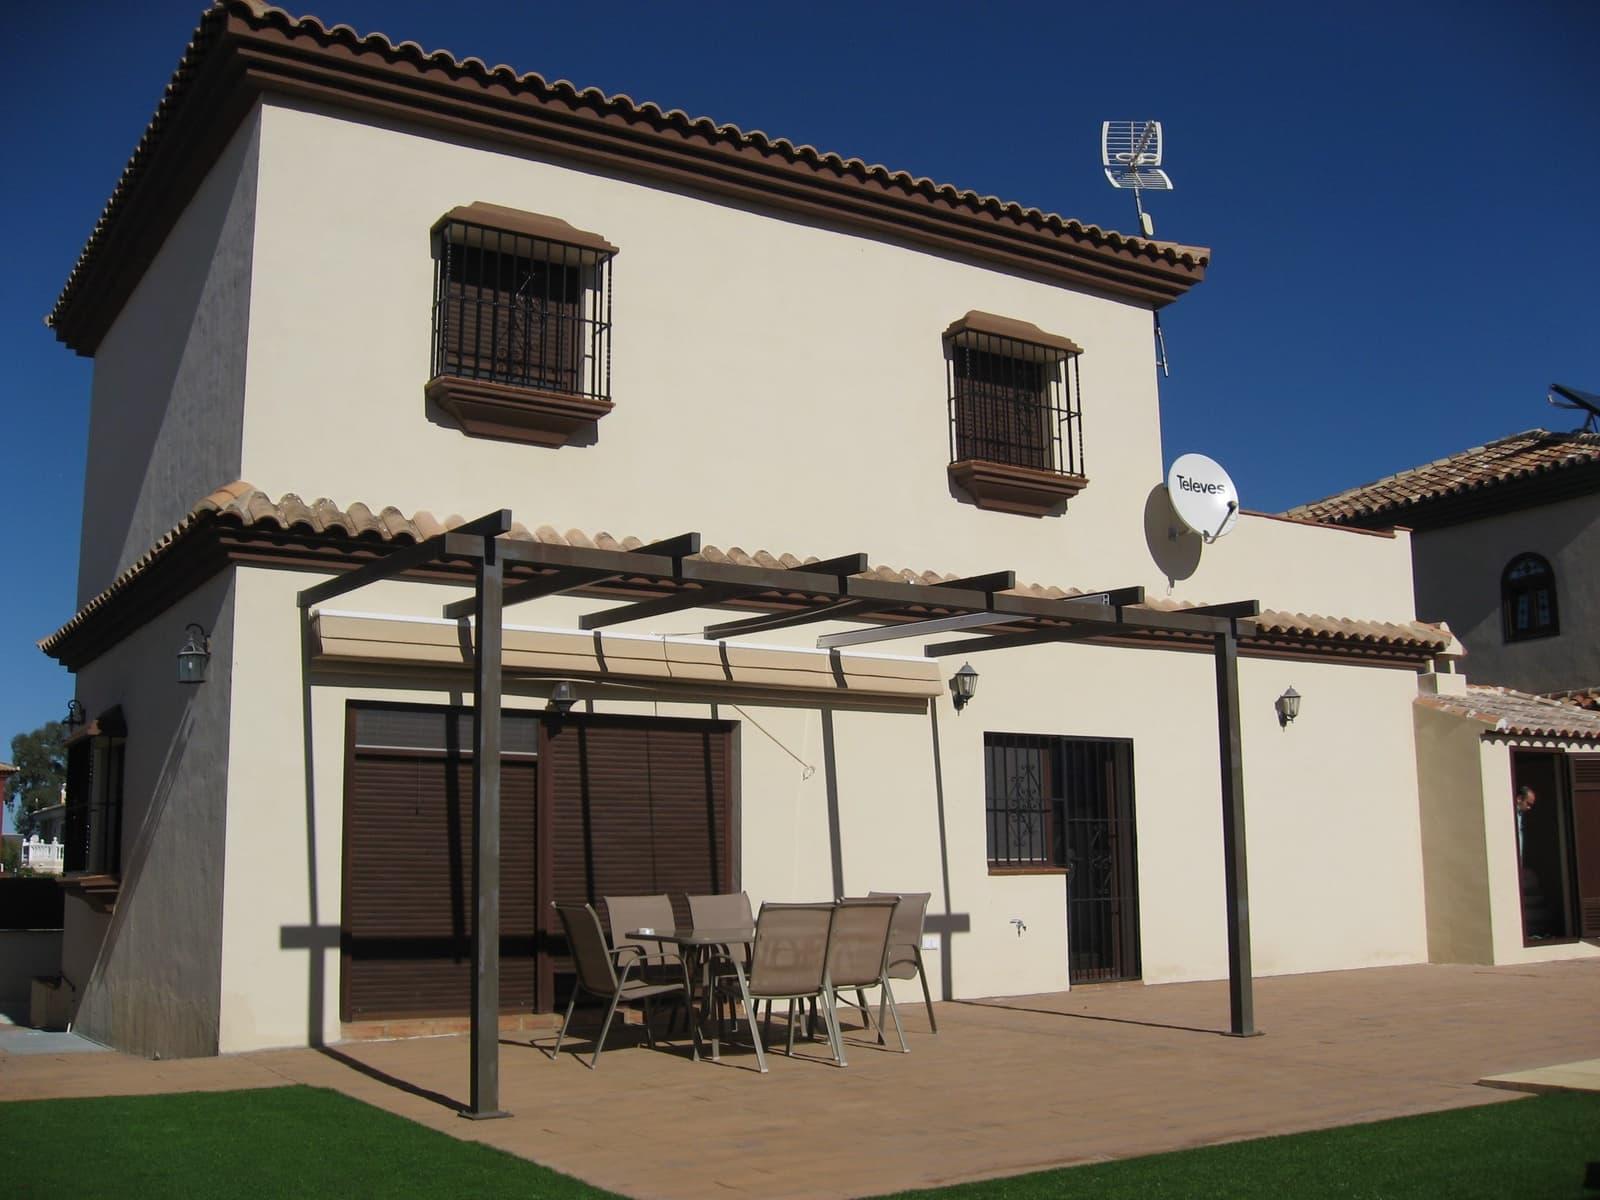 5 soverom Villa til salgs i Ronda med svømmebasseng garasje - € 349 000 (Ref: 3632372)